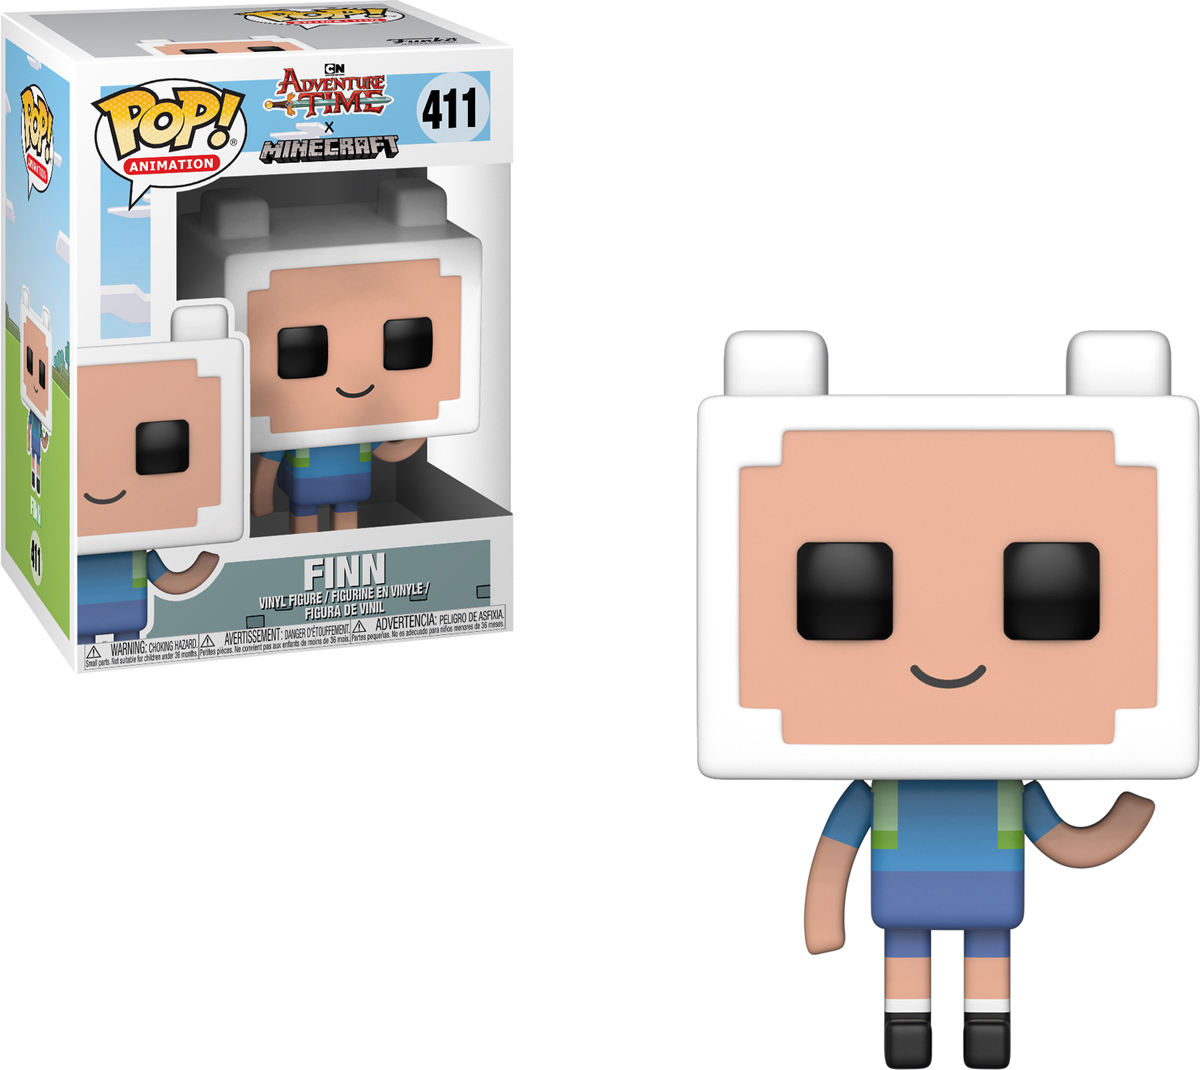 Фигурка Funko POP! Vinyl: Adventure Time/Minecraft S1: Finn 32235 фигурка funko pop vinyl yu gi oh s1 yami yugi 27448